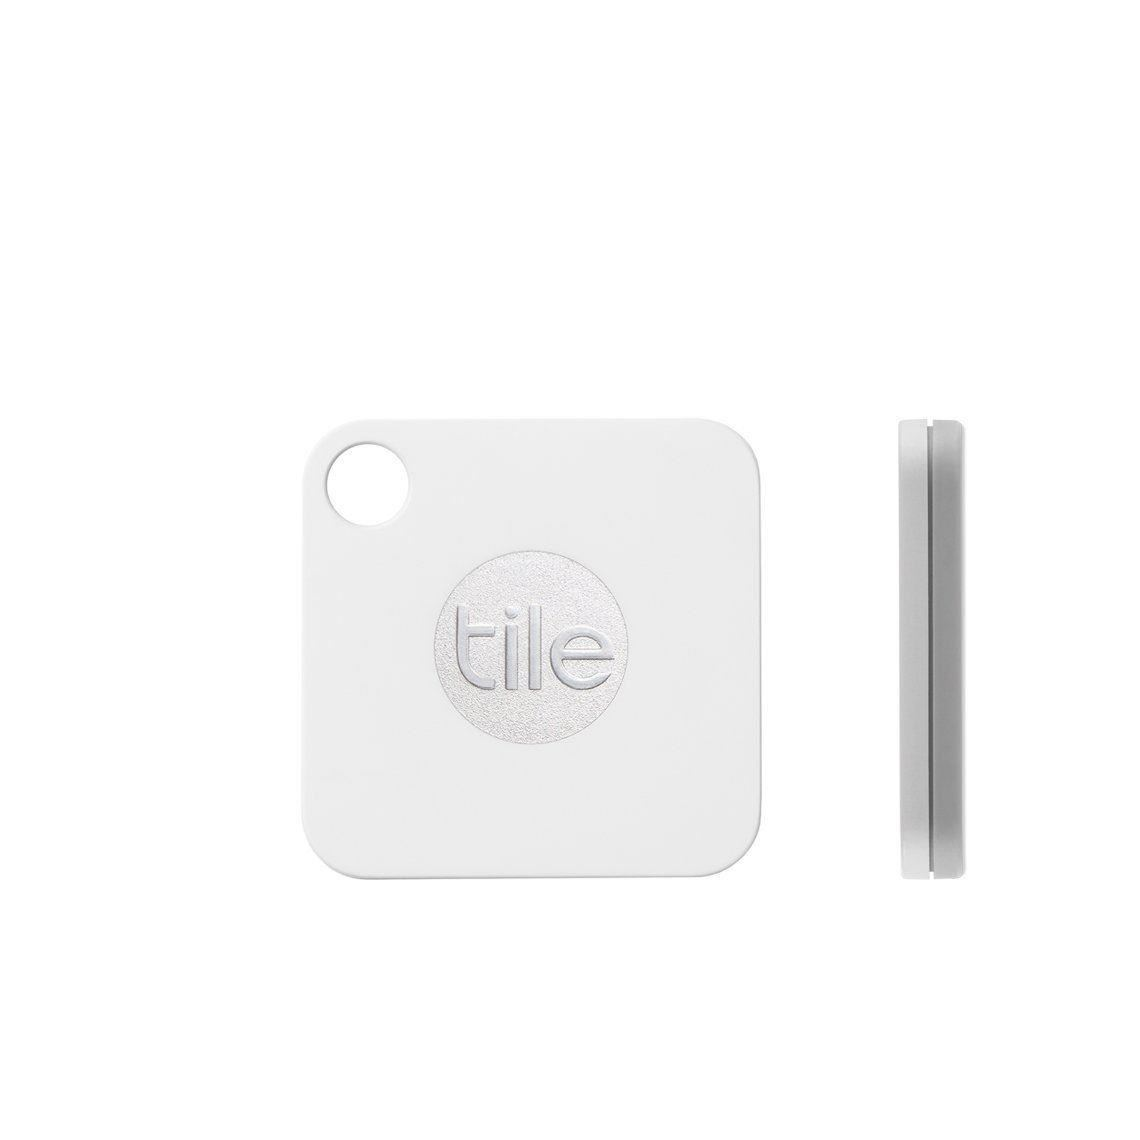 Tile Mate Gps Bluetooth Tracker Key Finder Locator